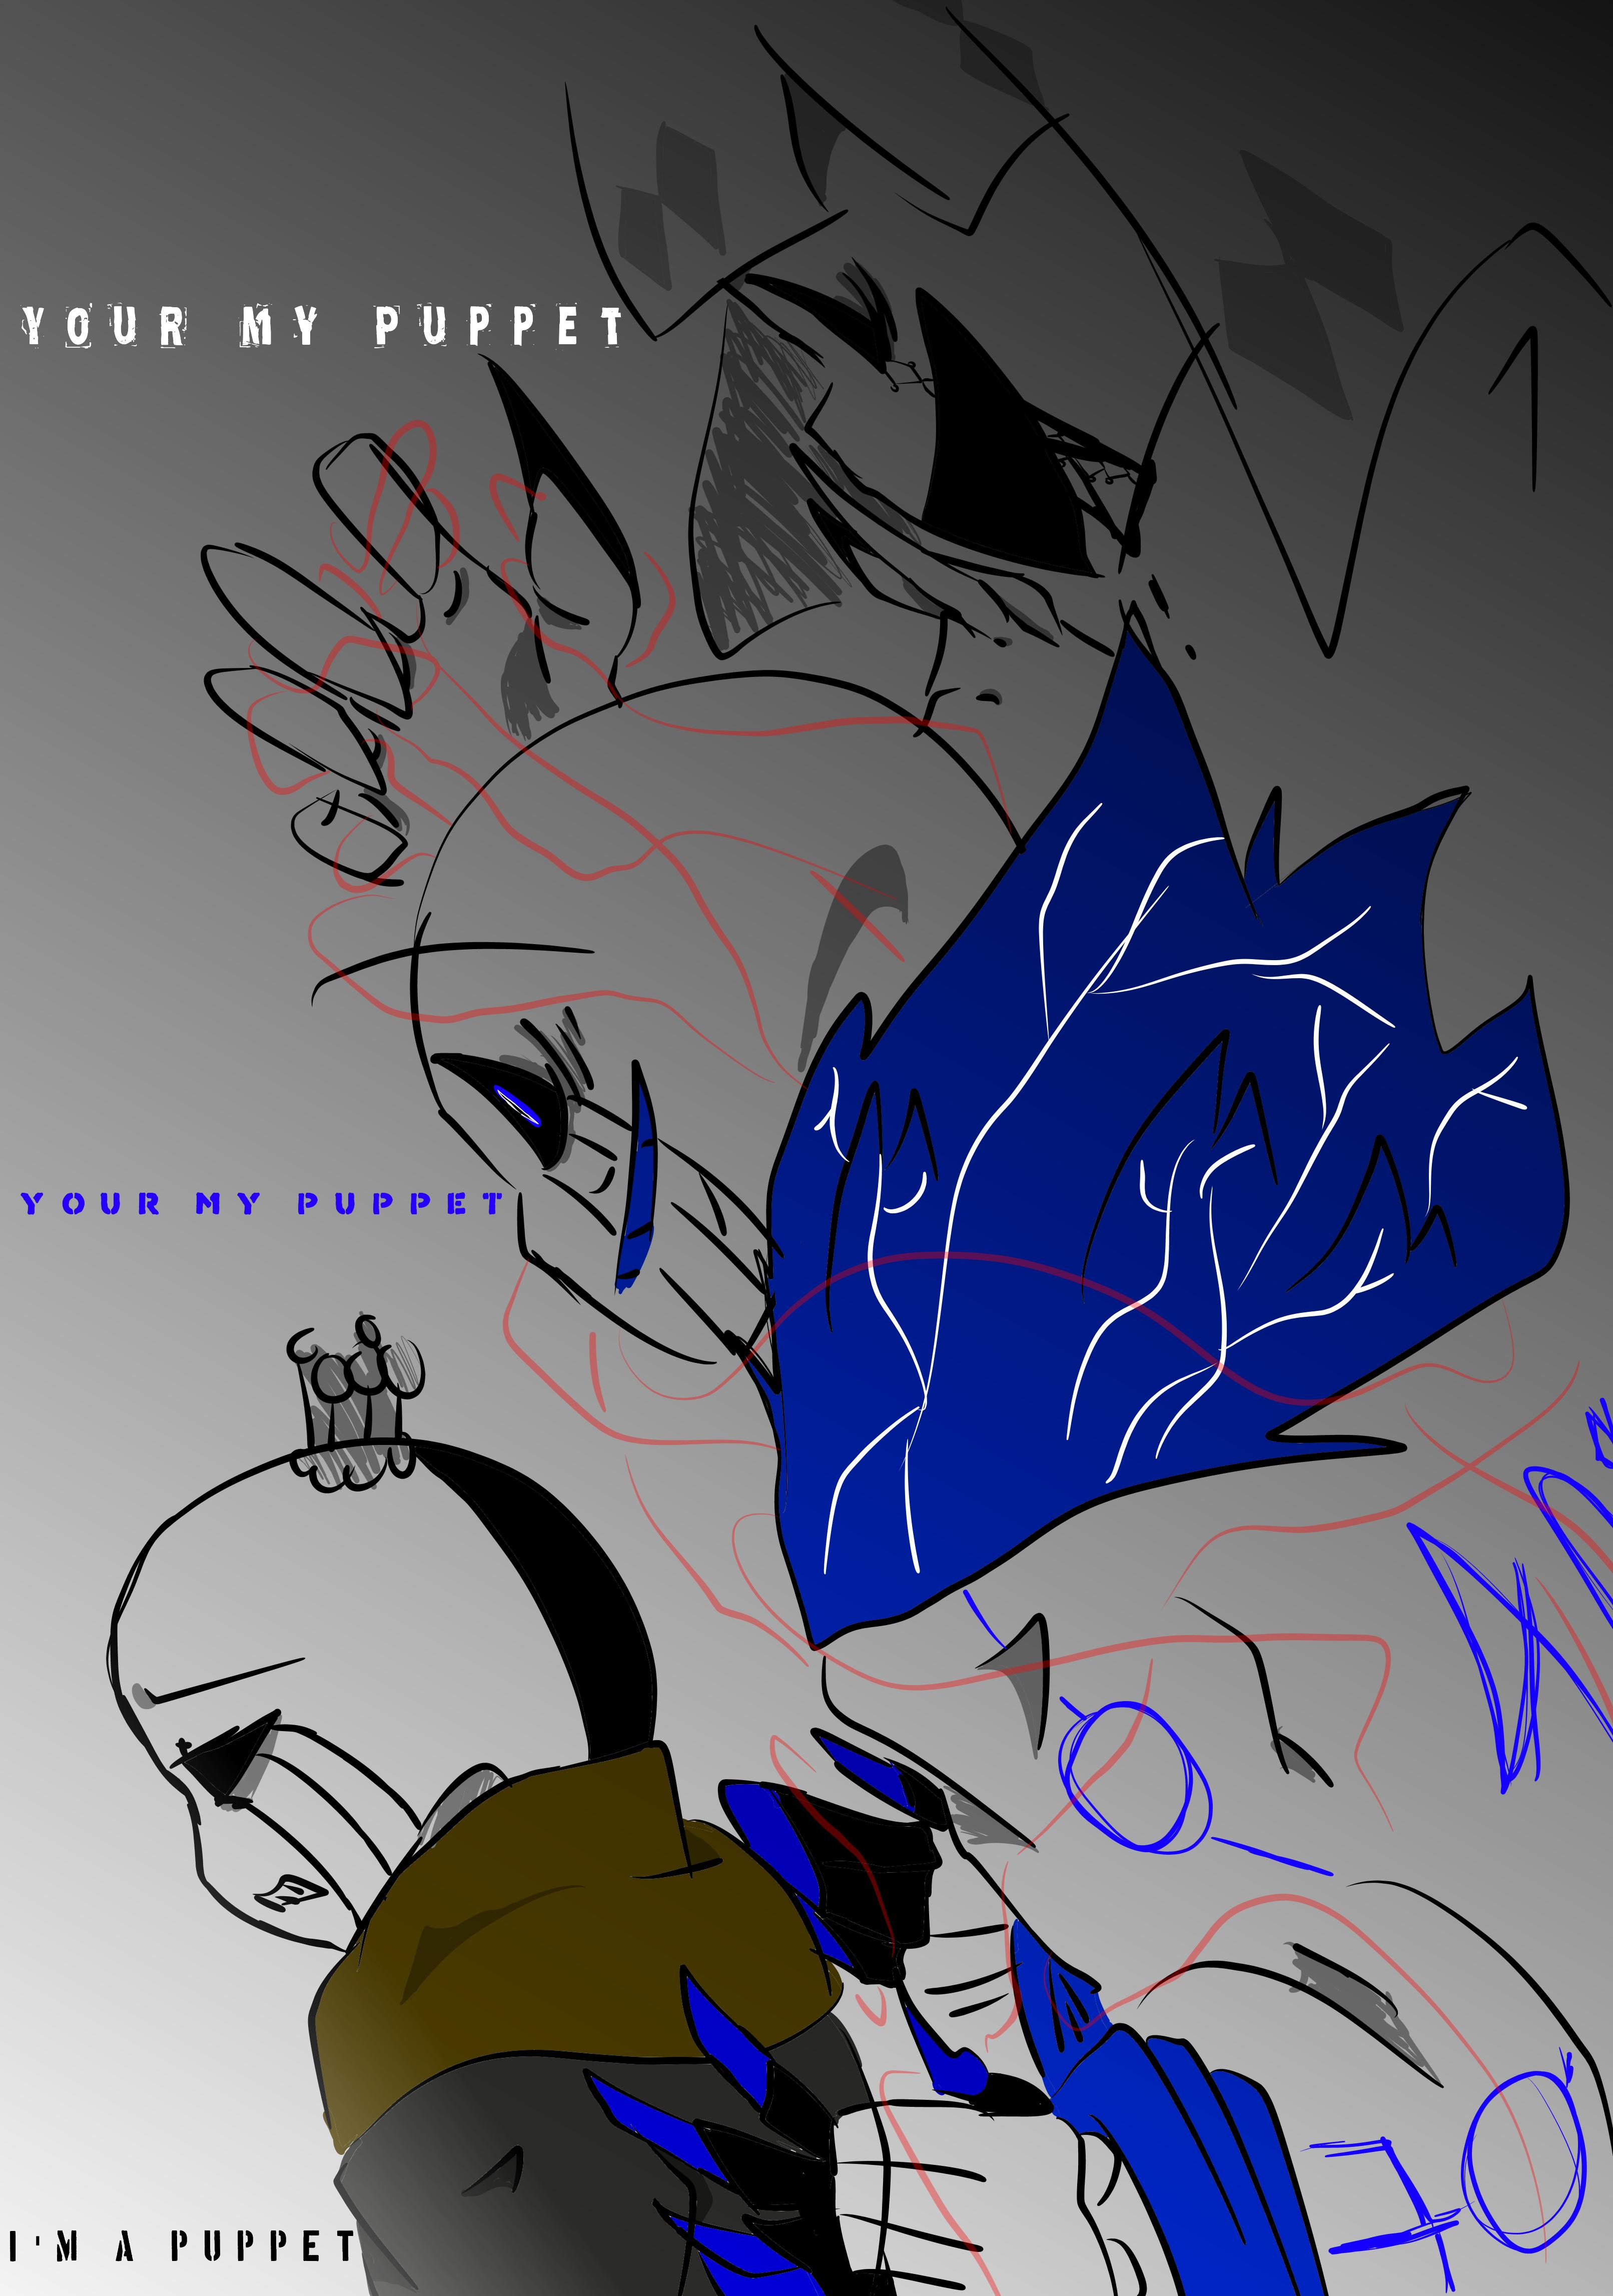 King Multiverse